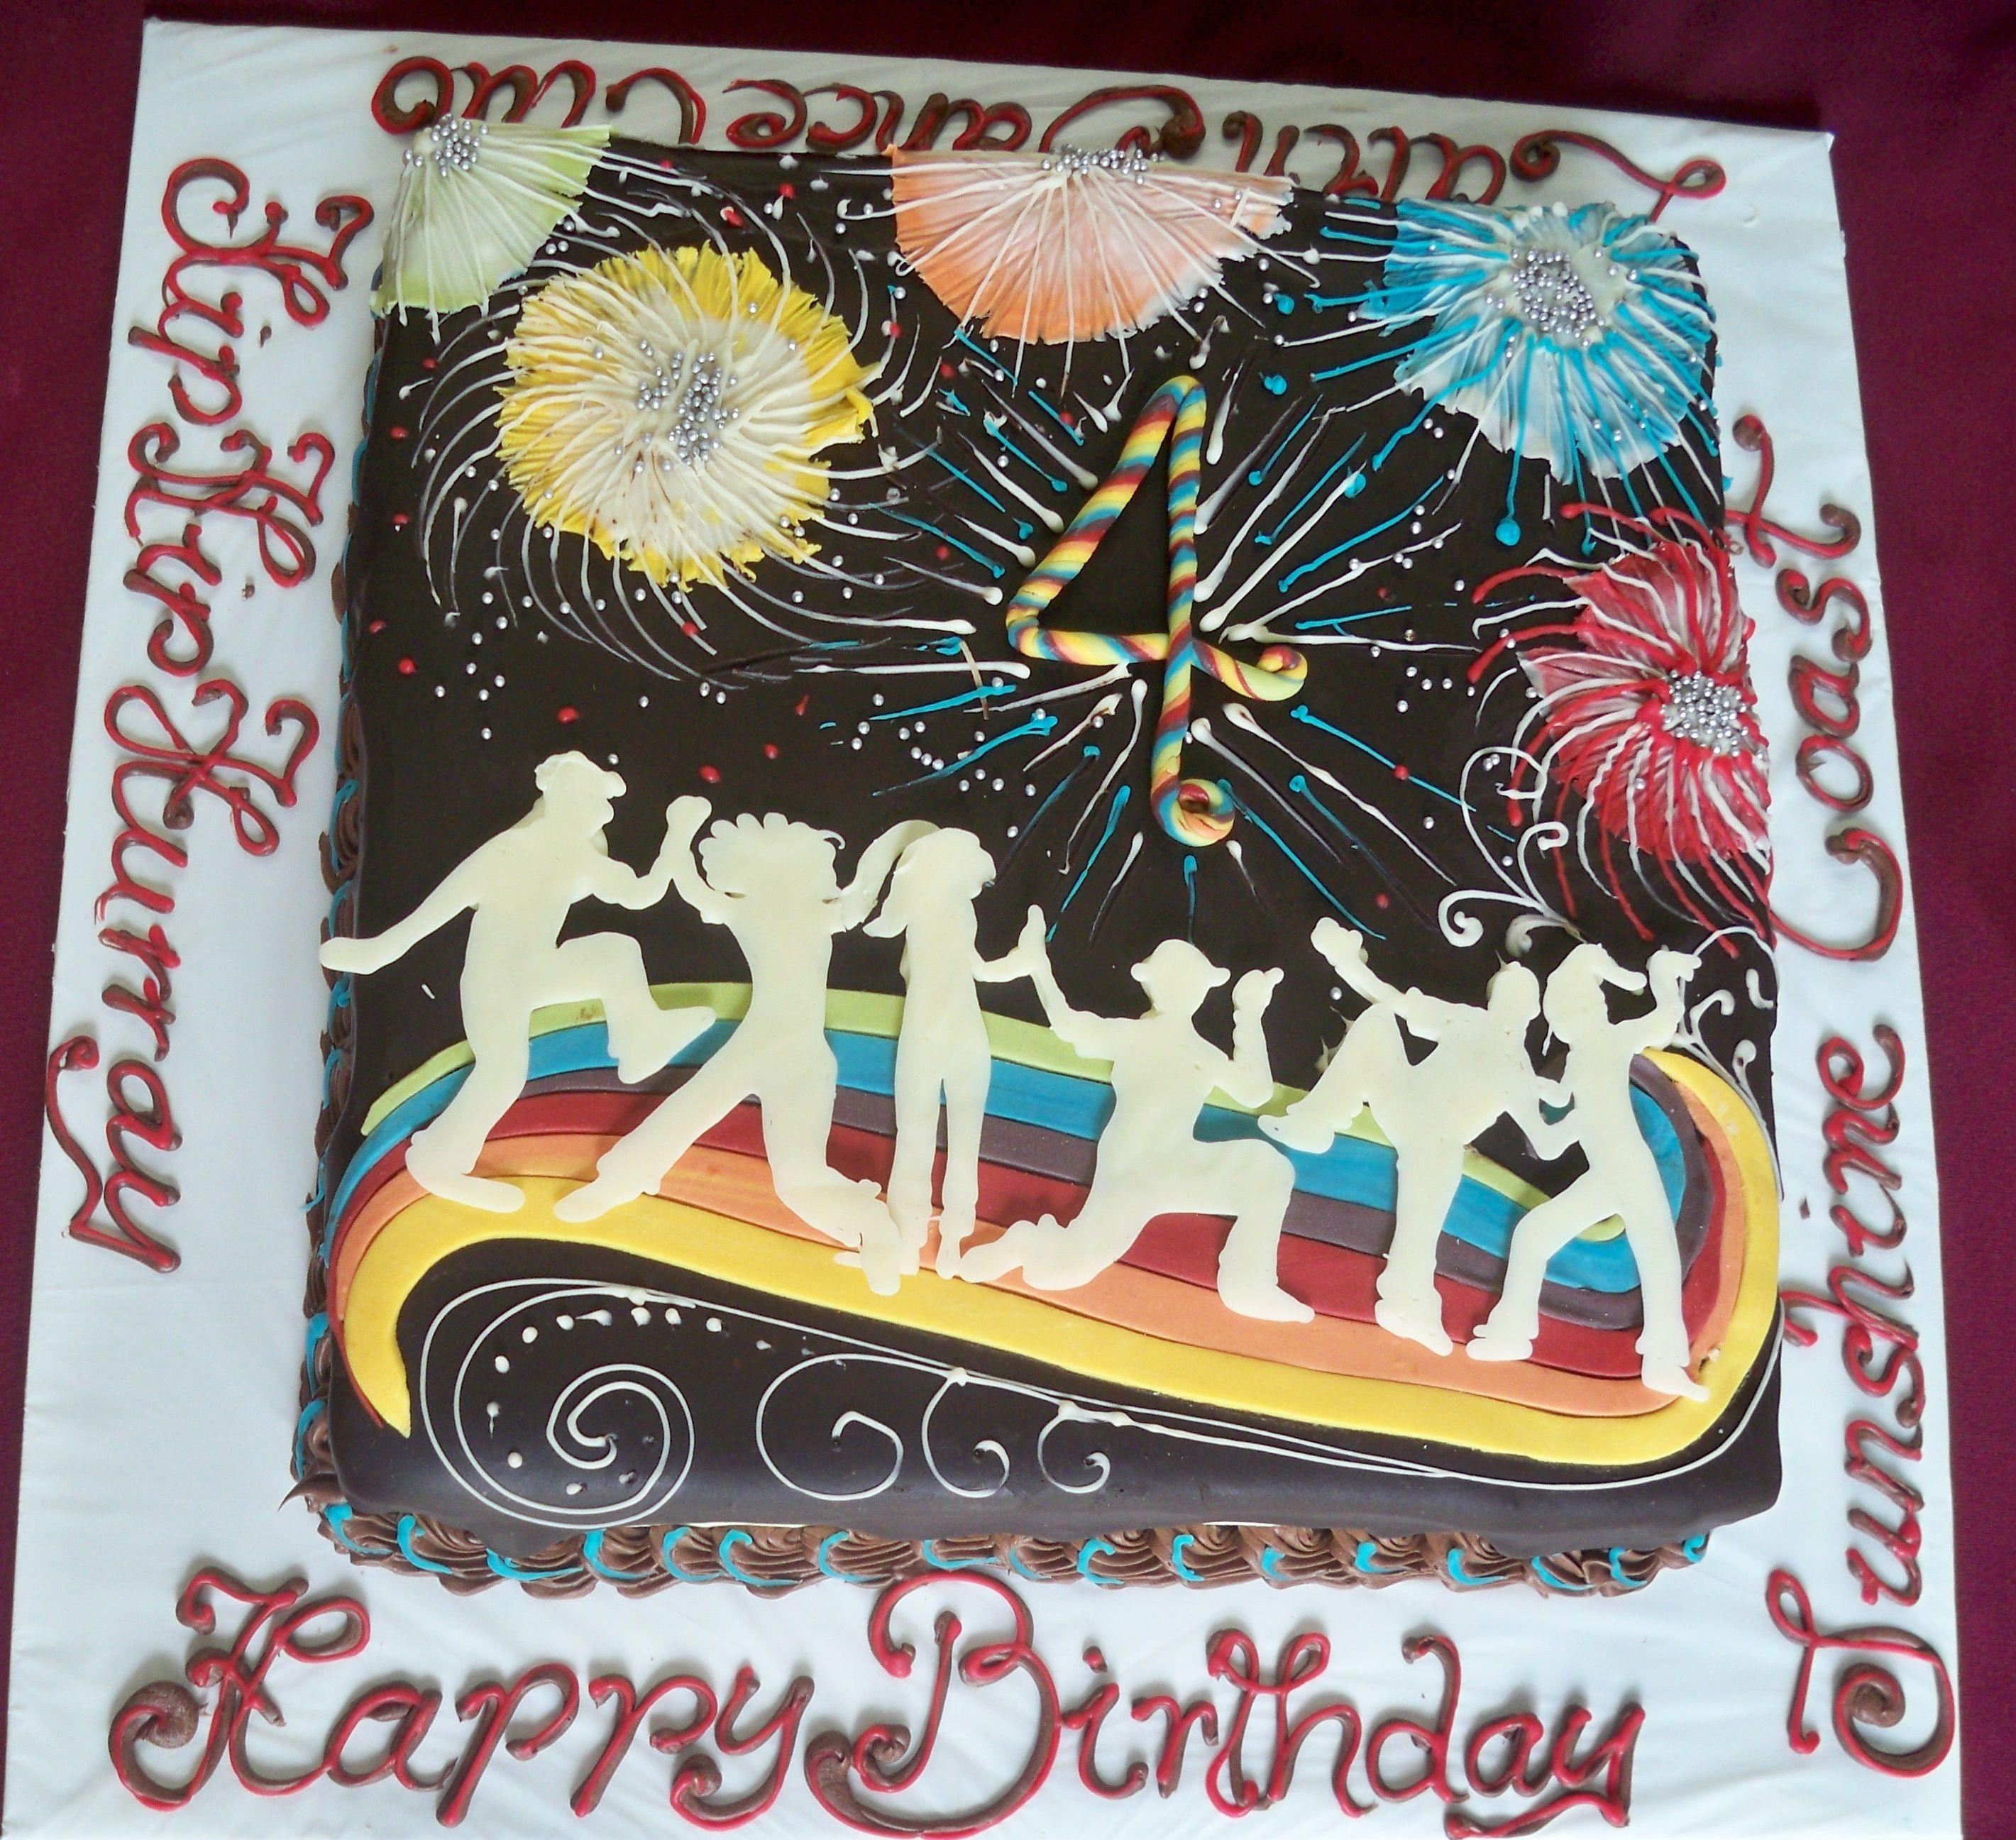 fireworks dancers party birthday cake httpwwwelisabethscakes